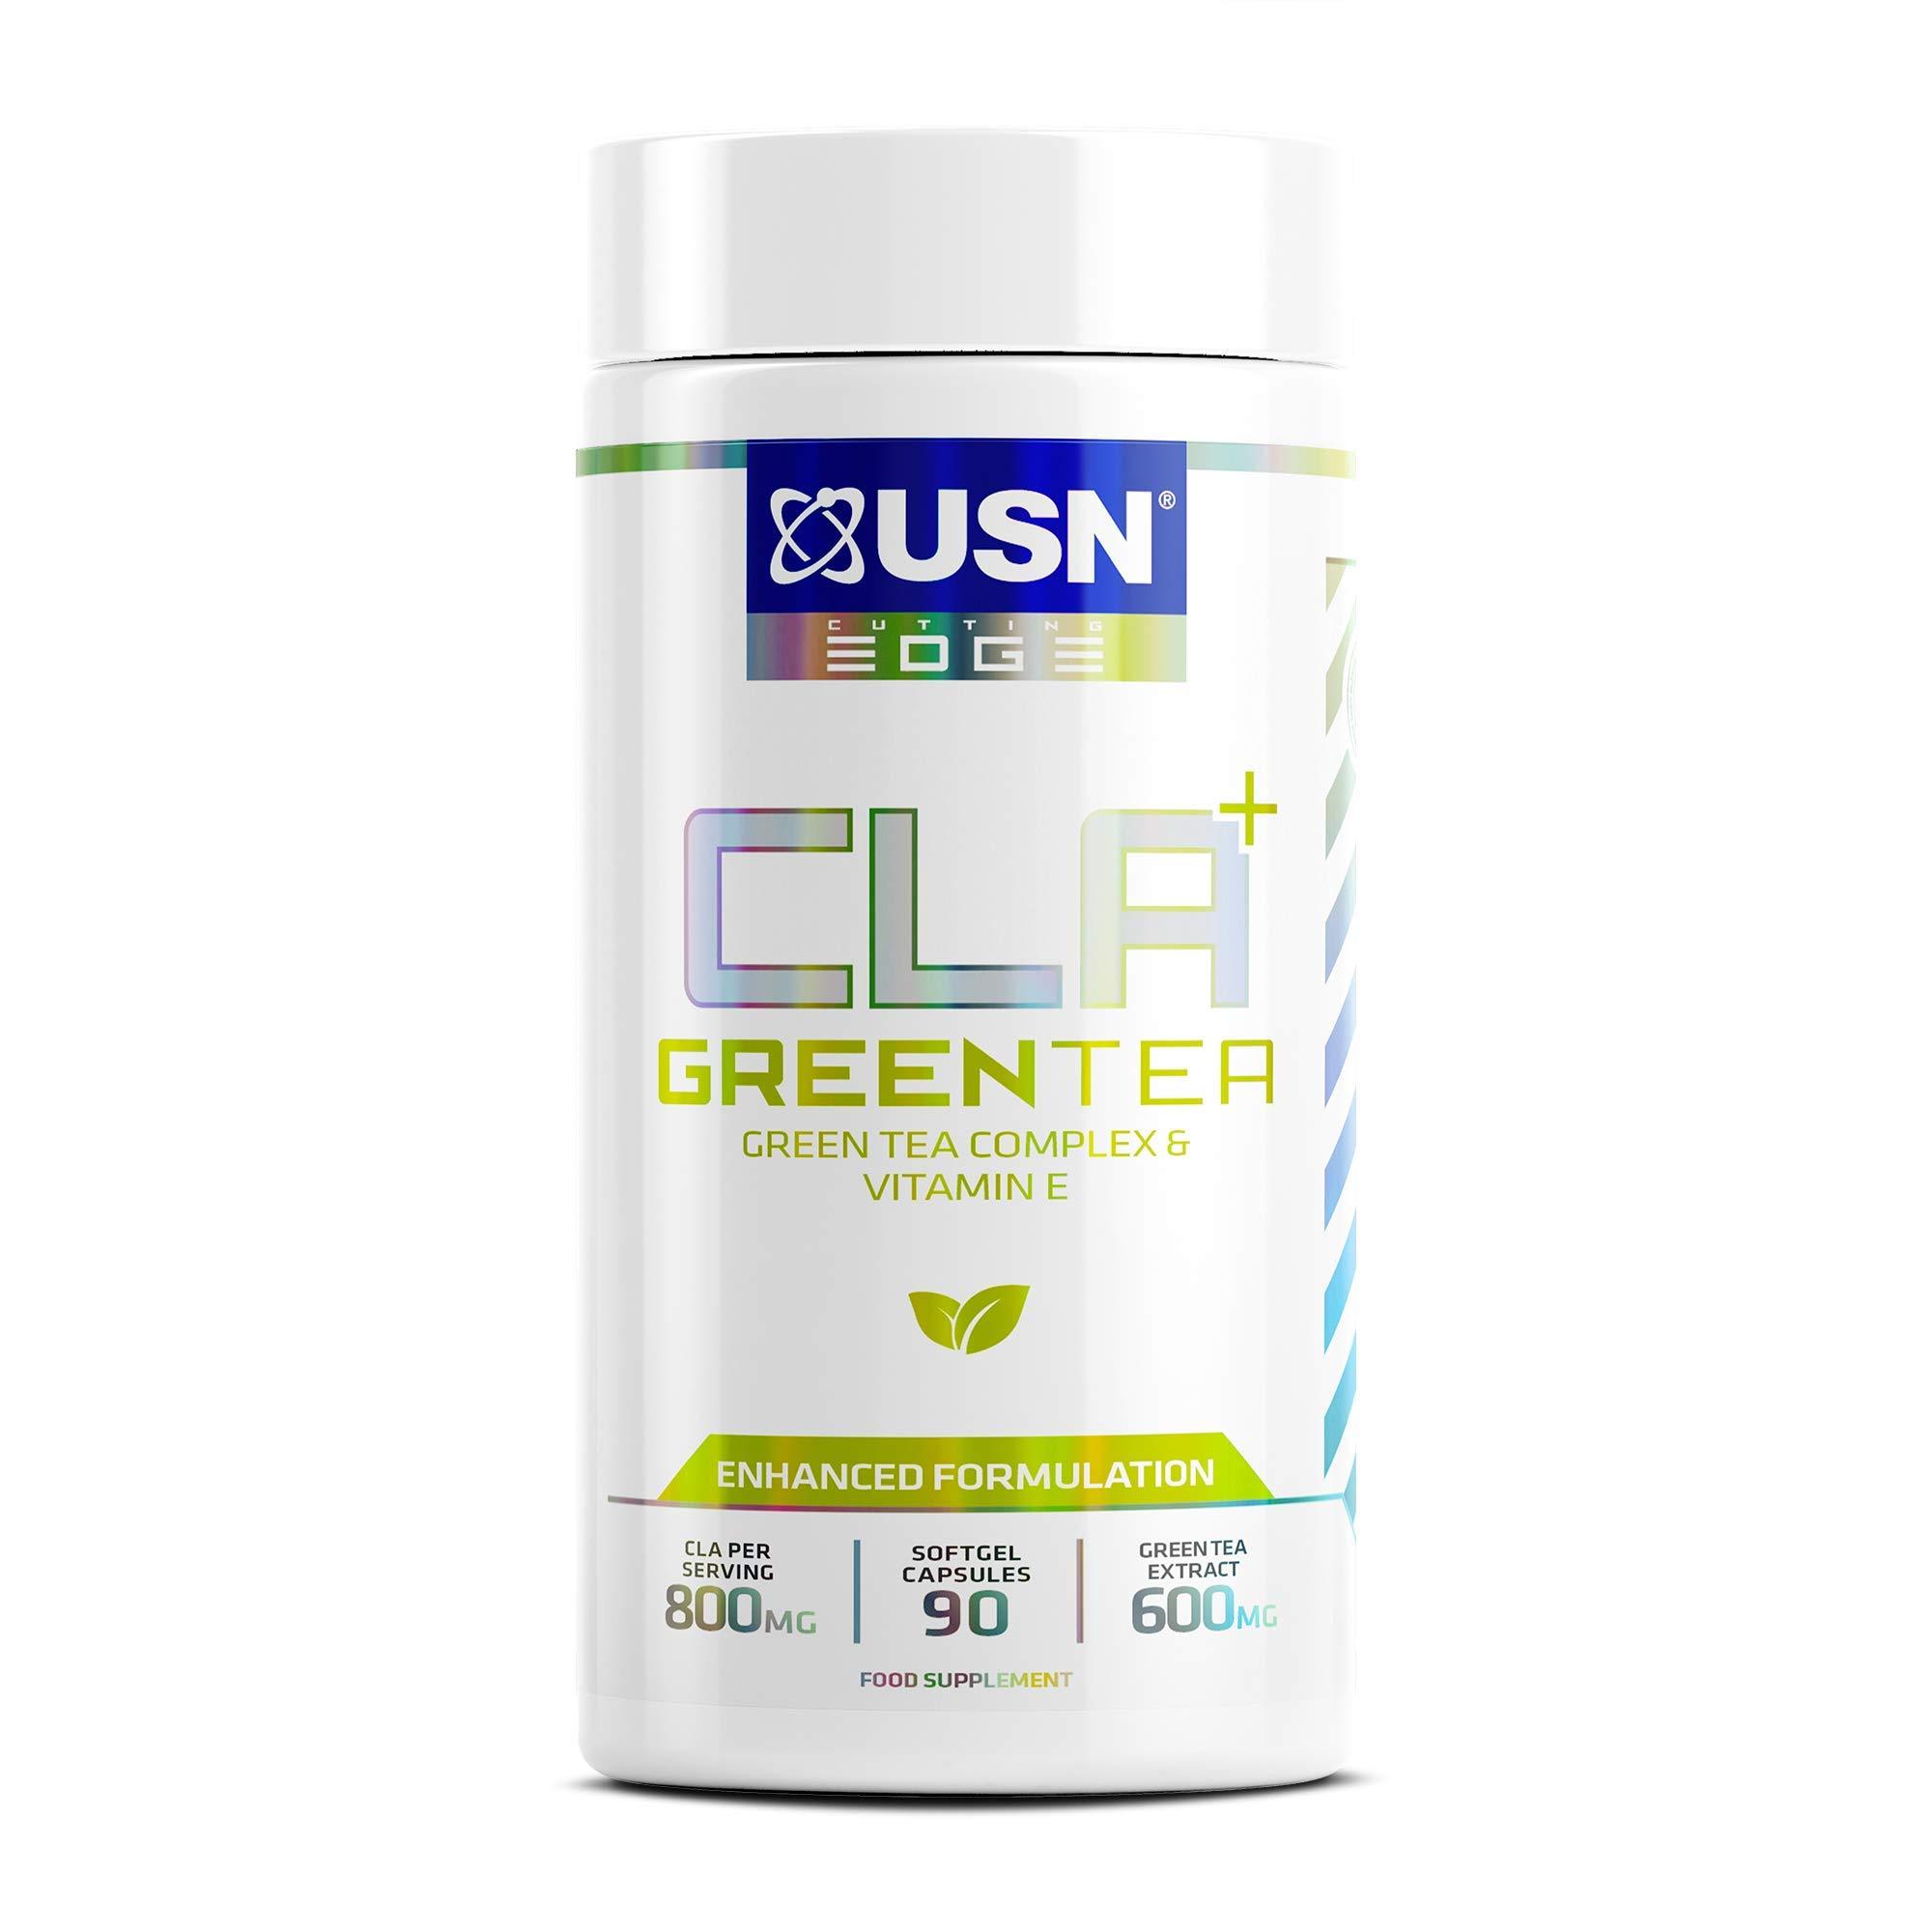 USN CLA Green Tea, Weight Loss 800 mg CLA, 600 mg Green Tea, 90 Soft Gel Capsules